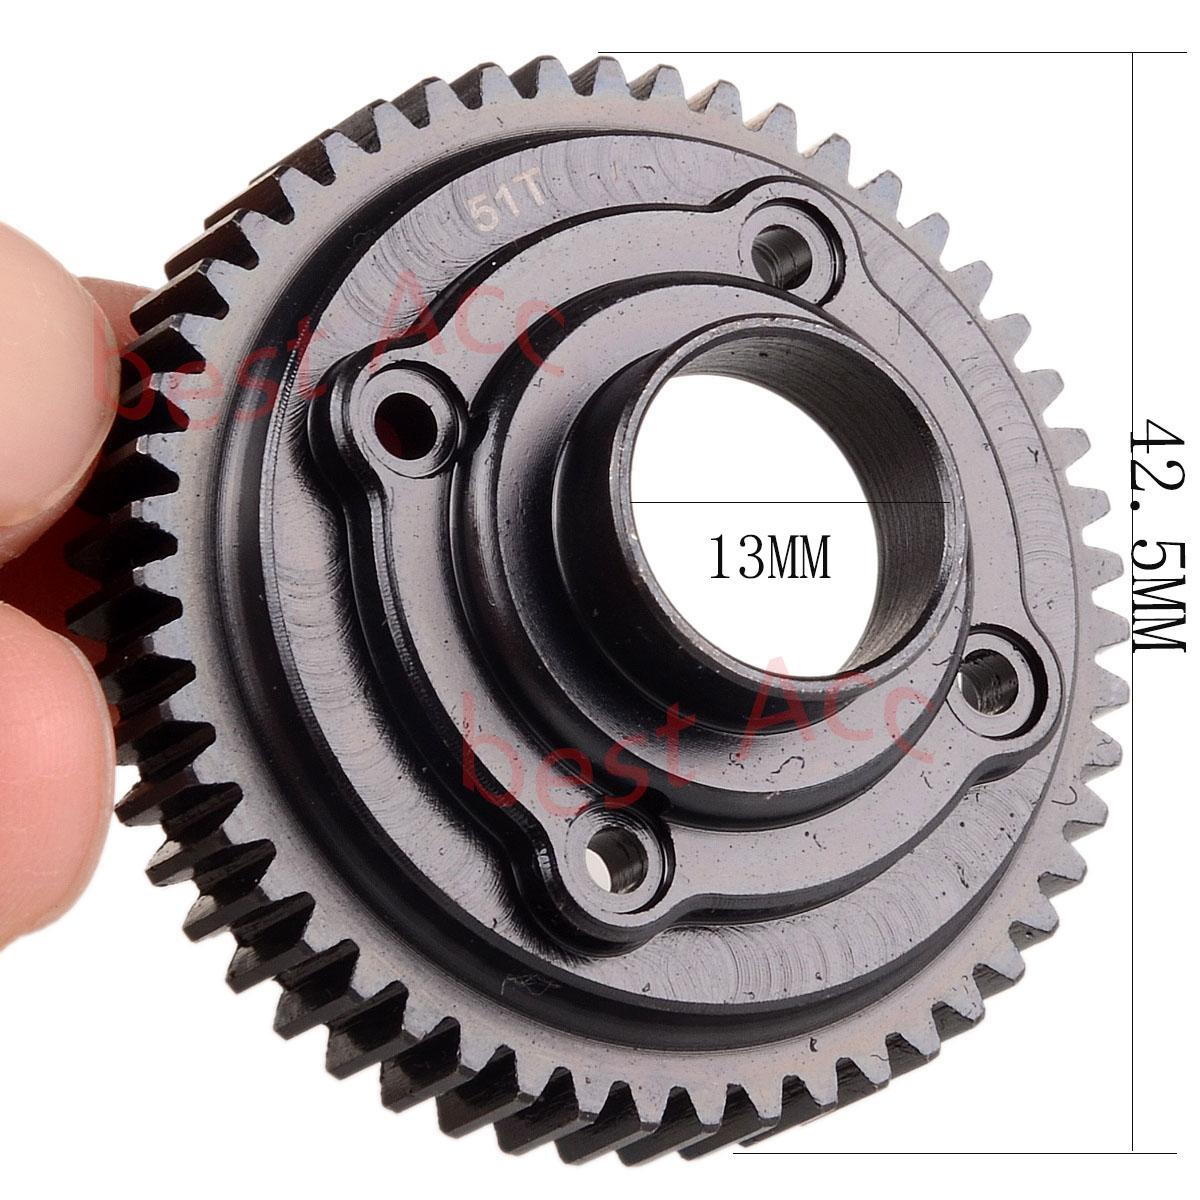 GPM UDR1200S HD REAR DIFFERENTIAL RING GEAR /& PINION GEAR TRAXXAS 1//7 UDR UNLIMI